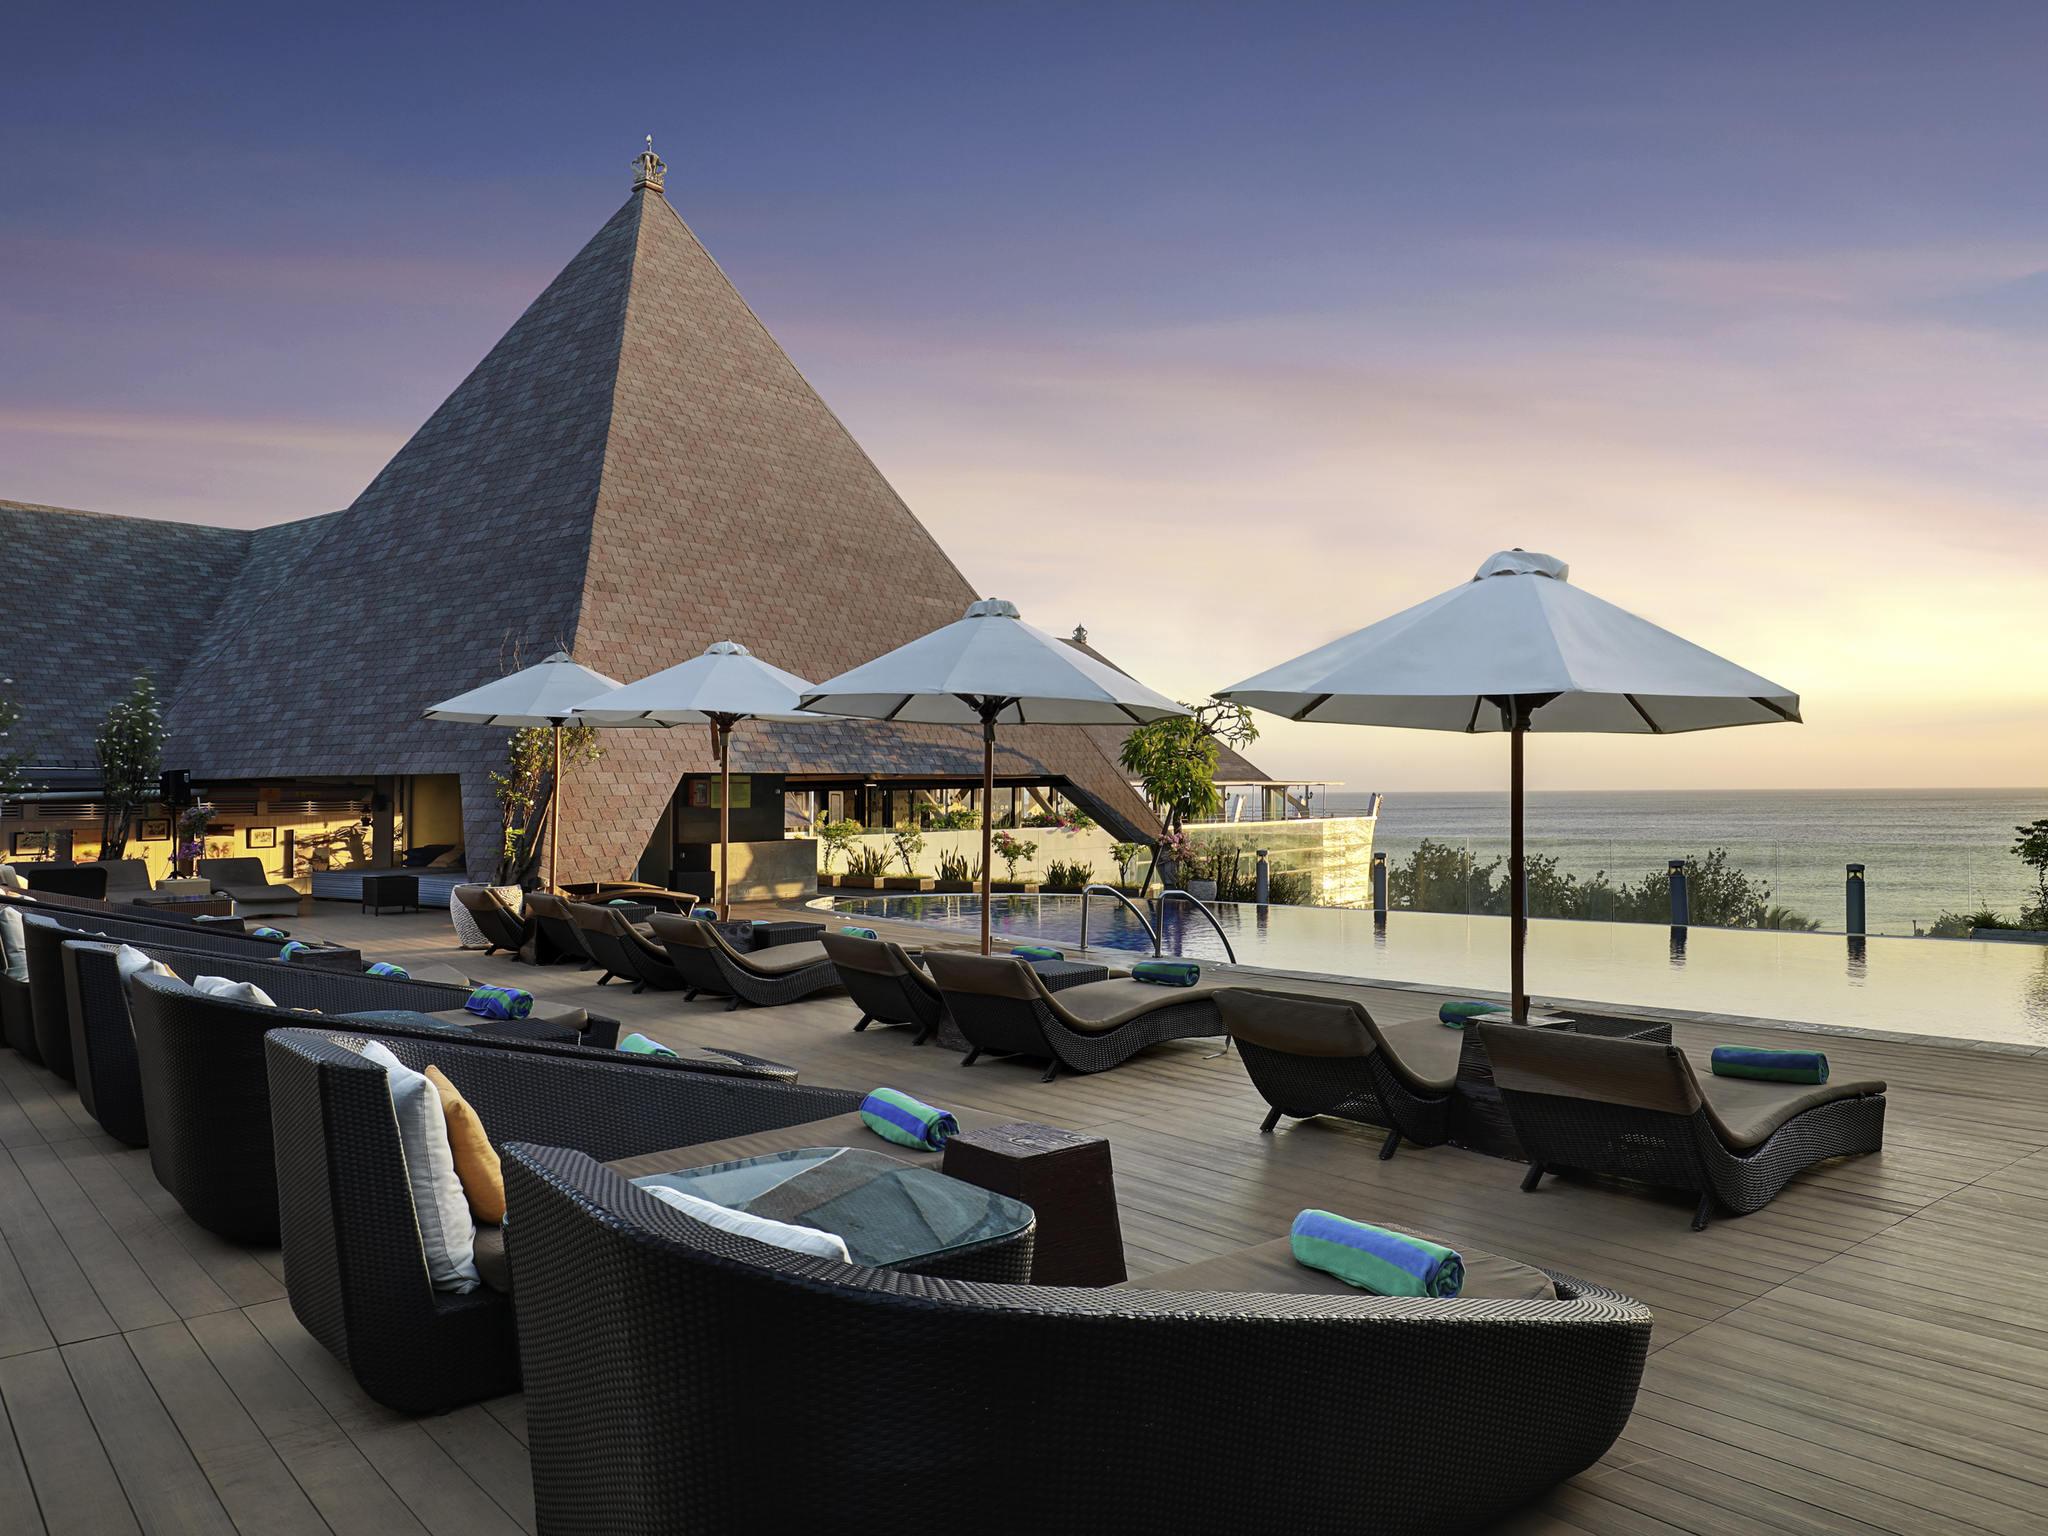 Hotel – The Kuta Beach Heritage Hotel Bali - Managed by AccorHotels